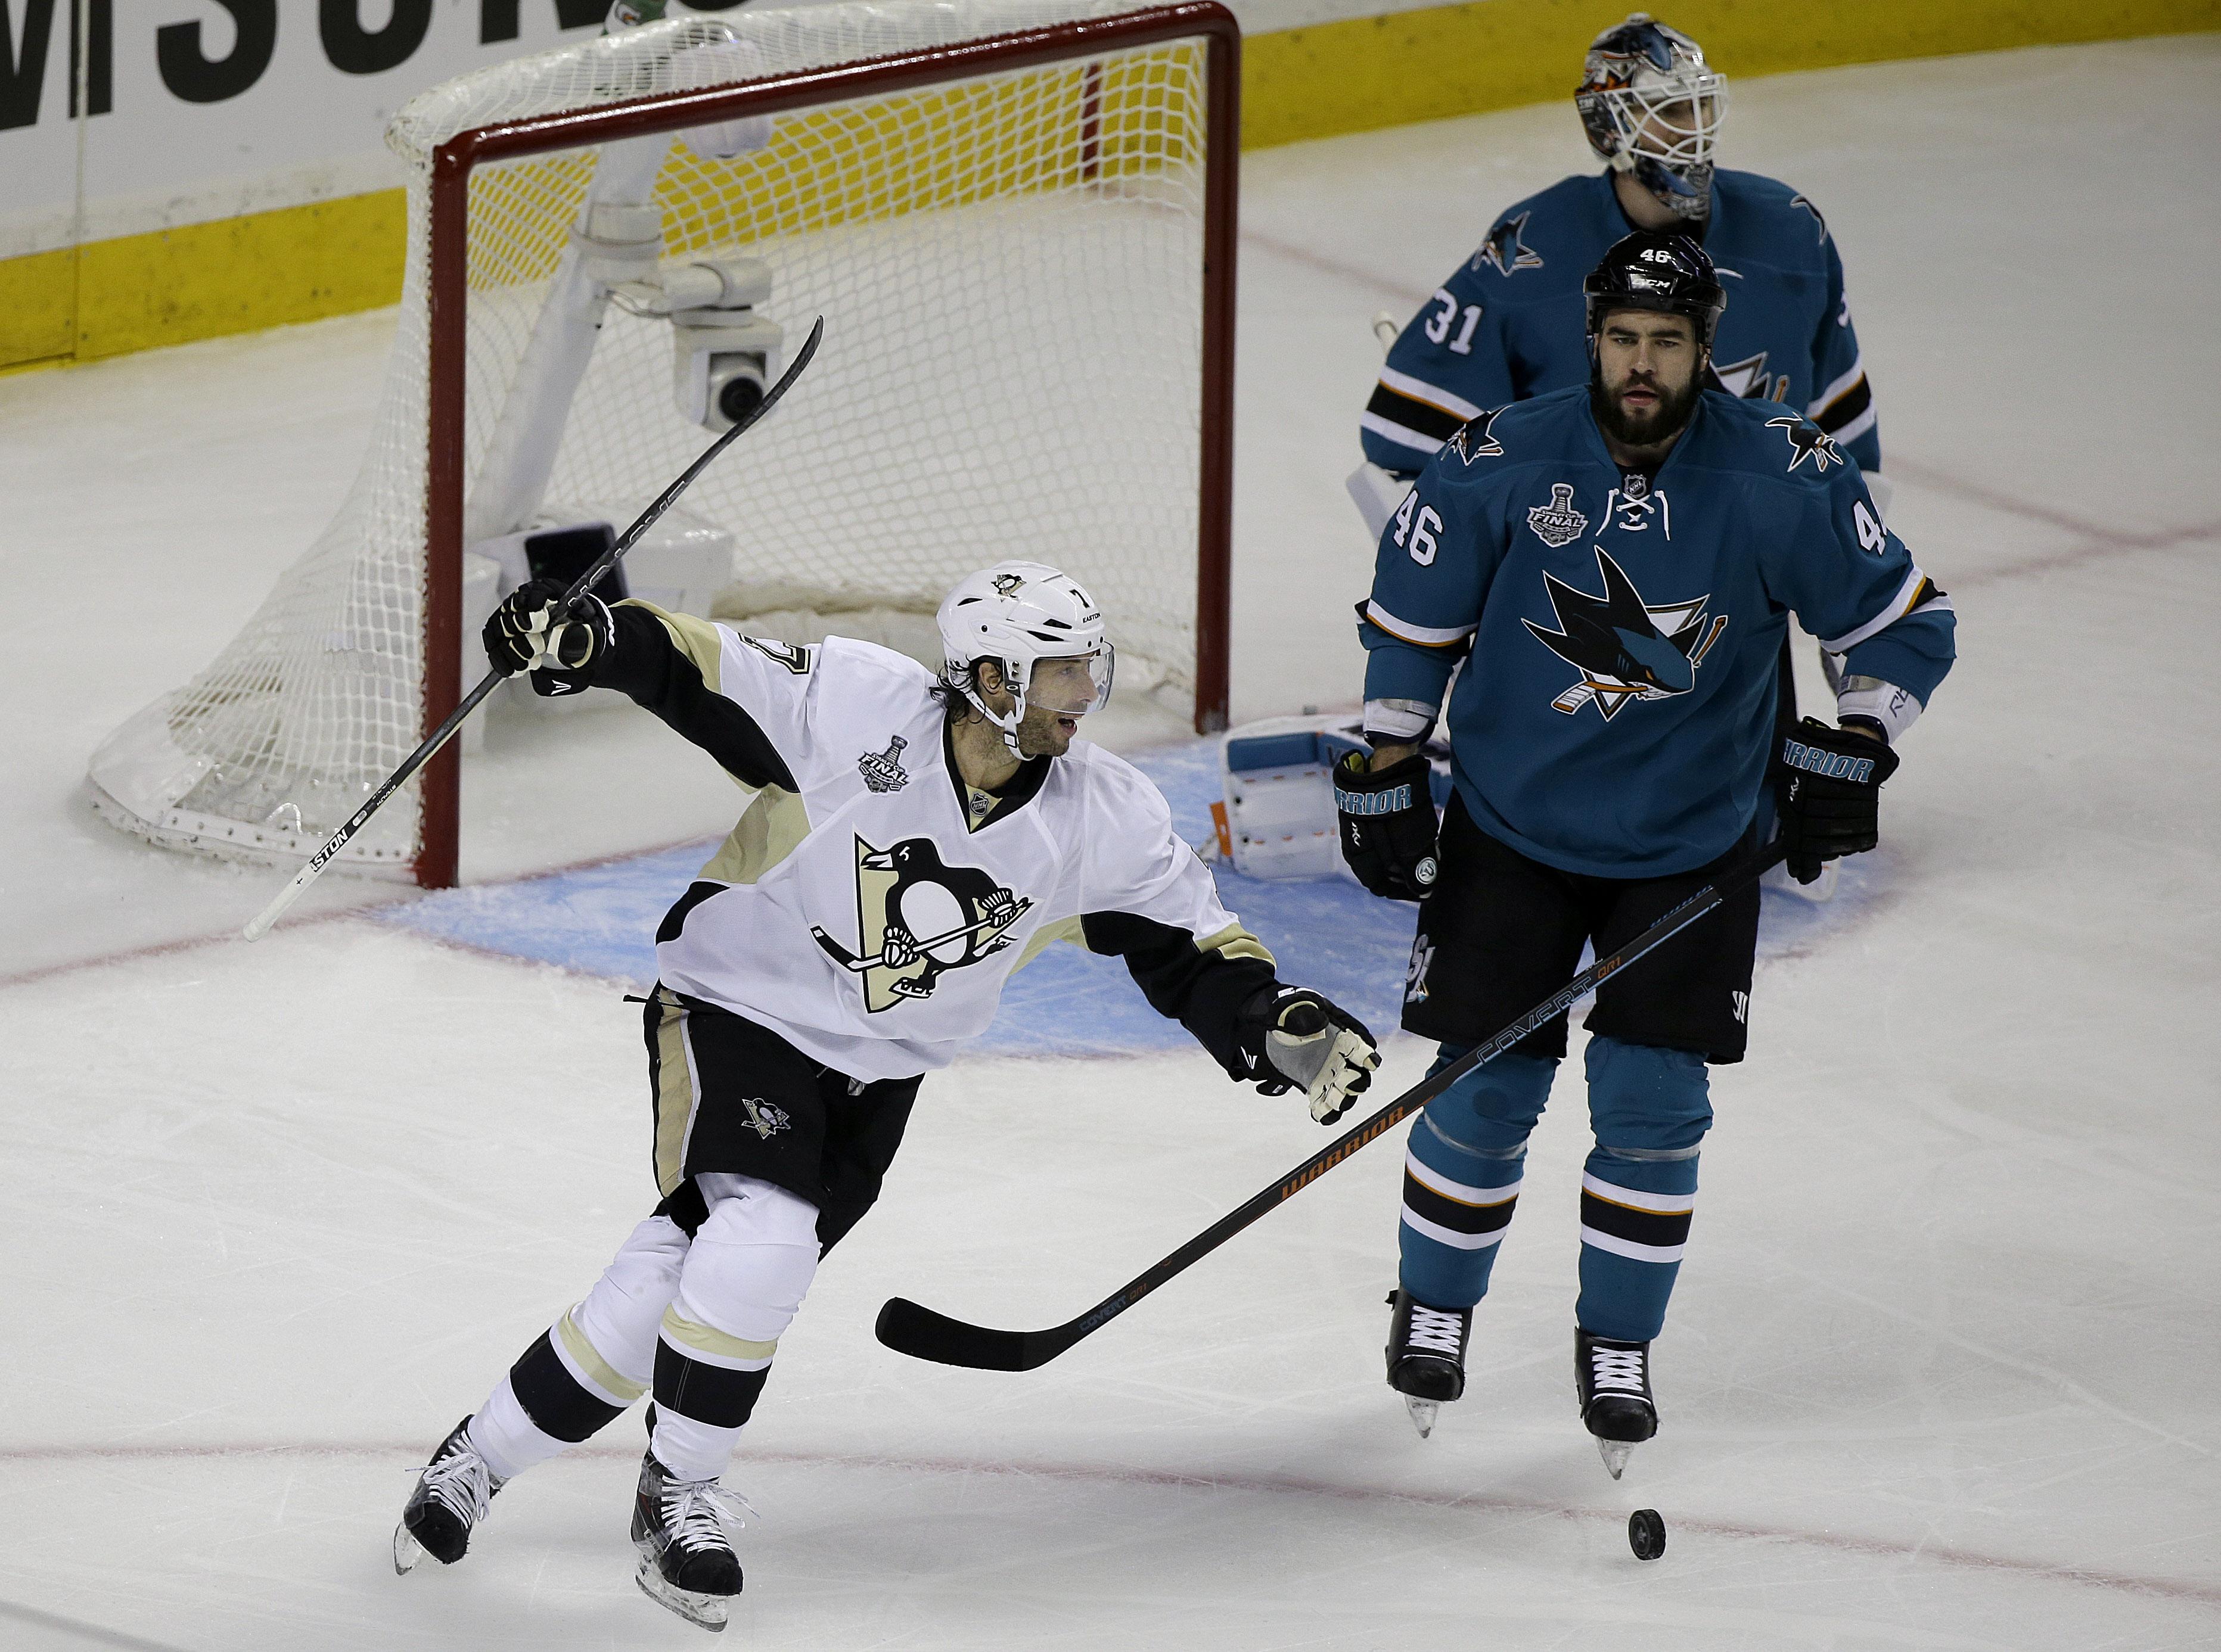 Pittsburgh Penguins center Matt Cullen, left, celebrates after teammate Ben Lovejoy scored a goal as San Jose Sharks defenseman Roman Polak (46), from the Czech Republic, and goalie Martin Jones react during the first period of Game 3 of the NHL hockey St